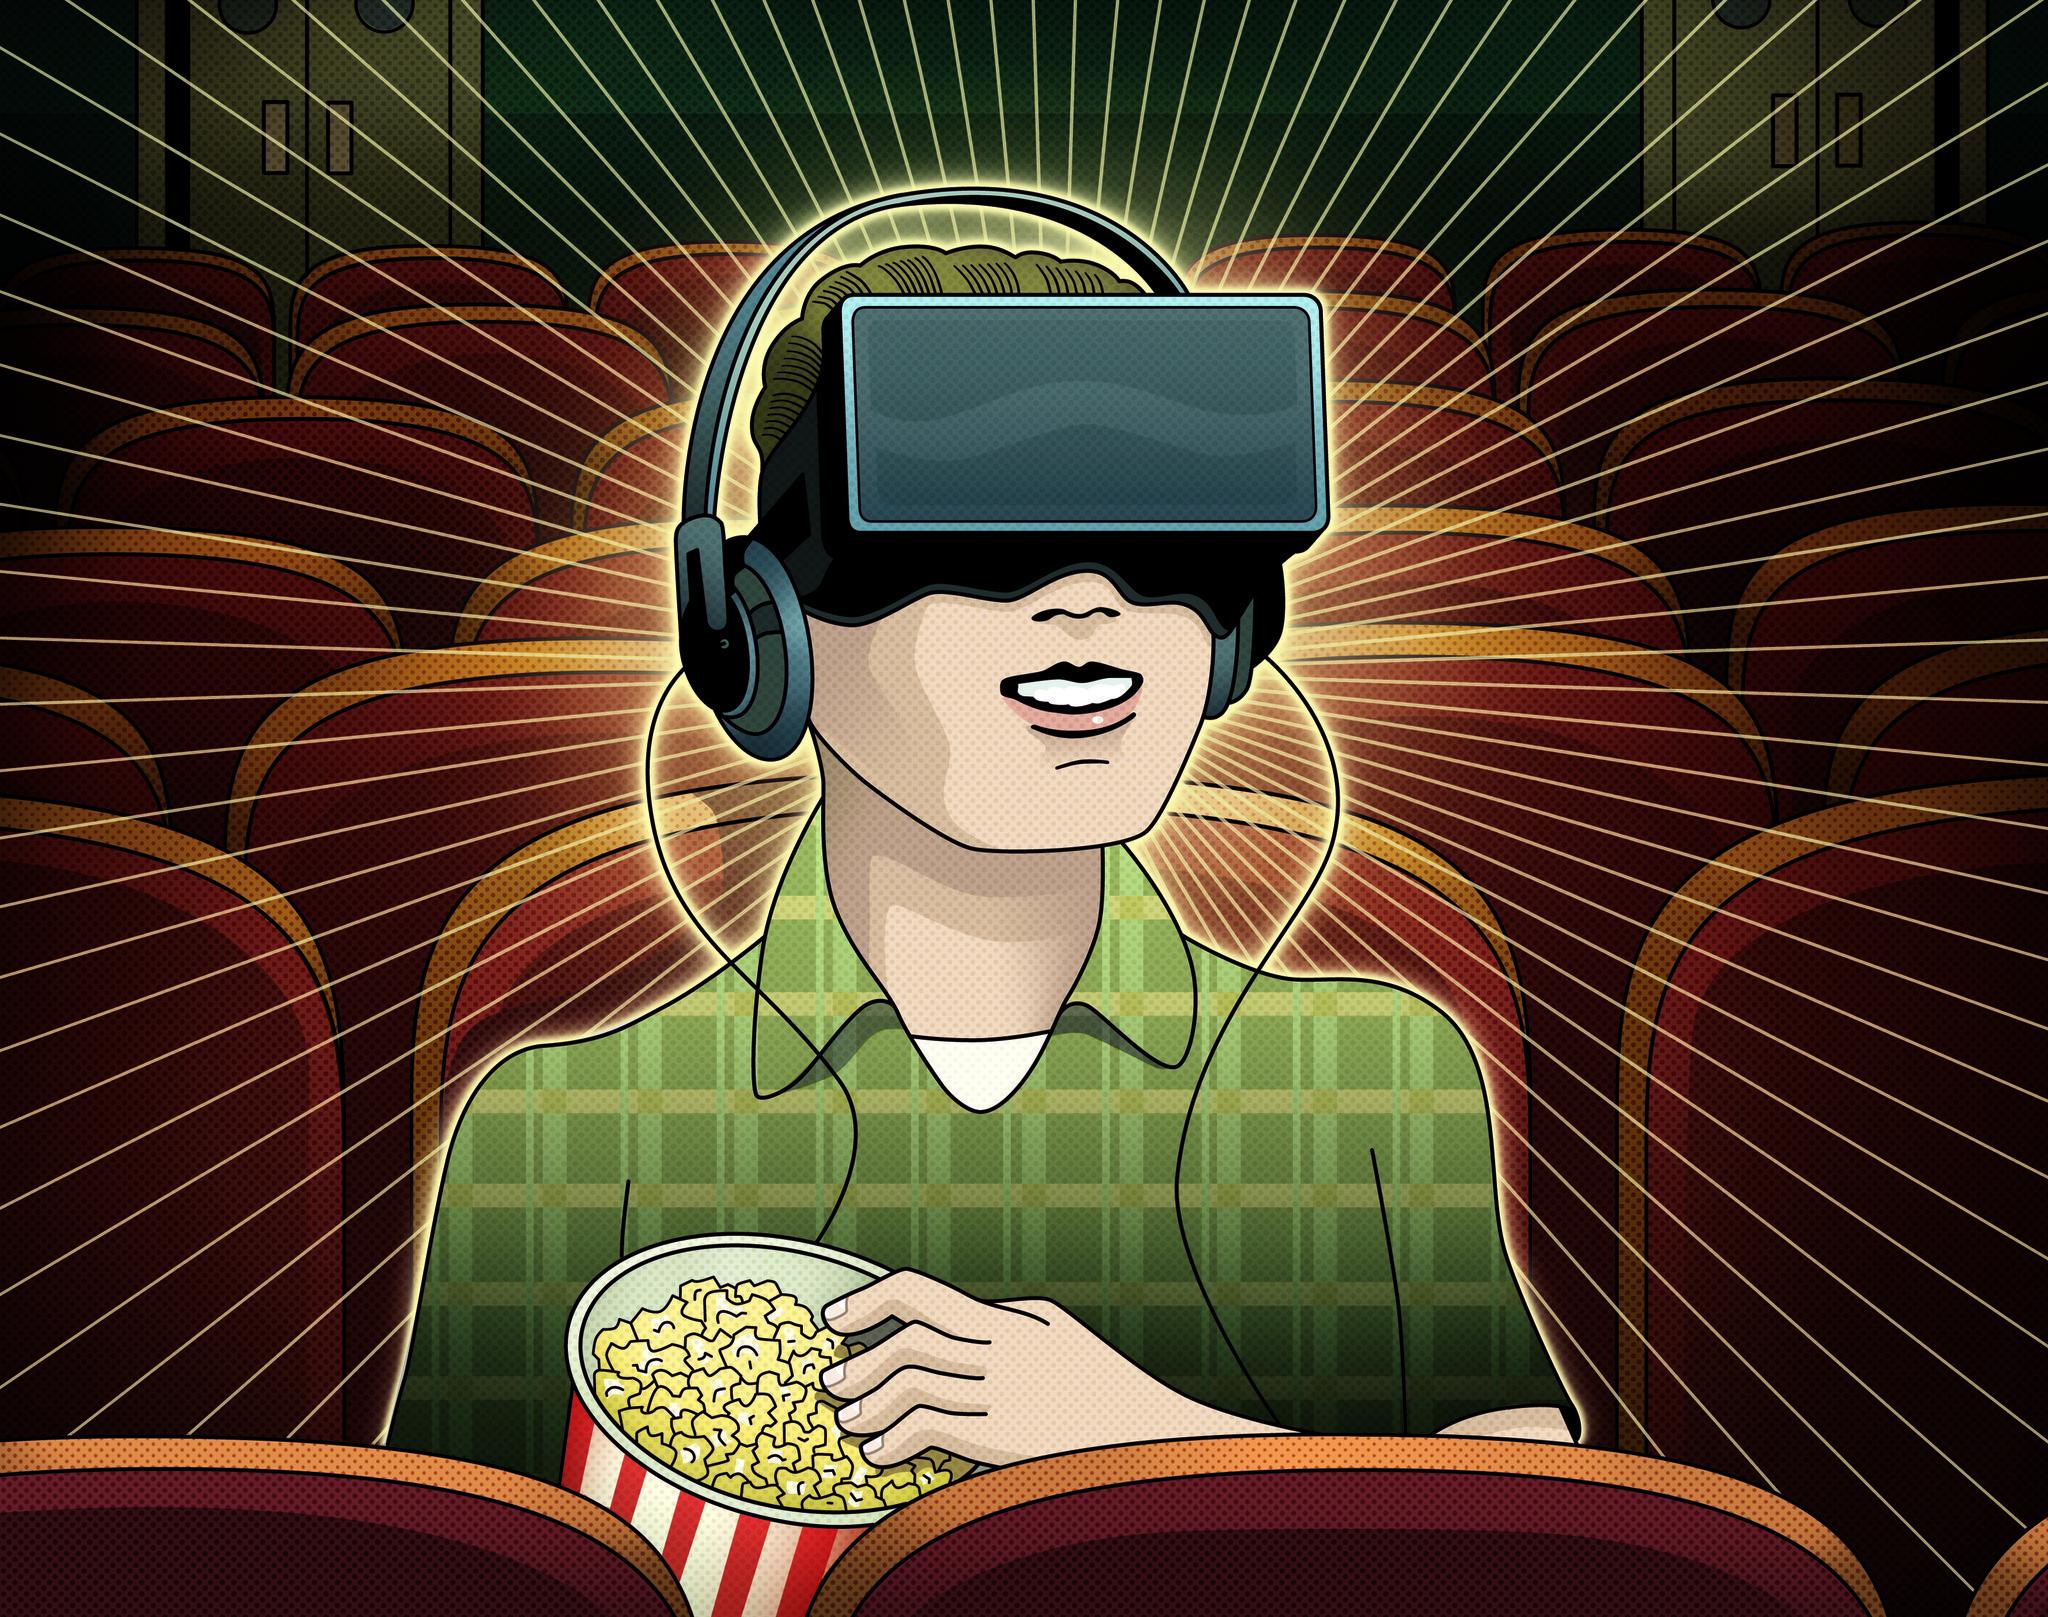 Virtual porn totally liberates yourself